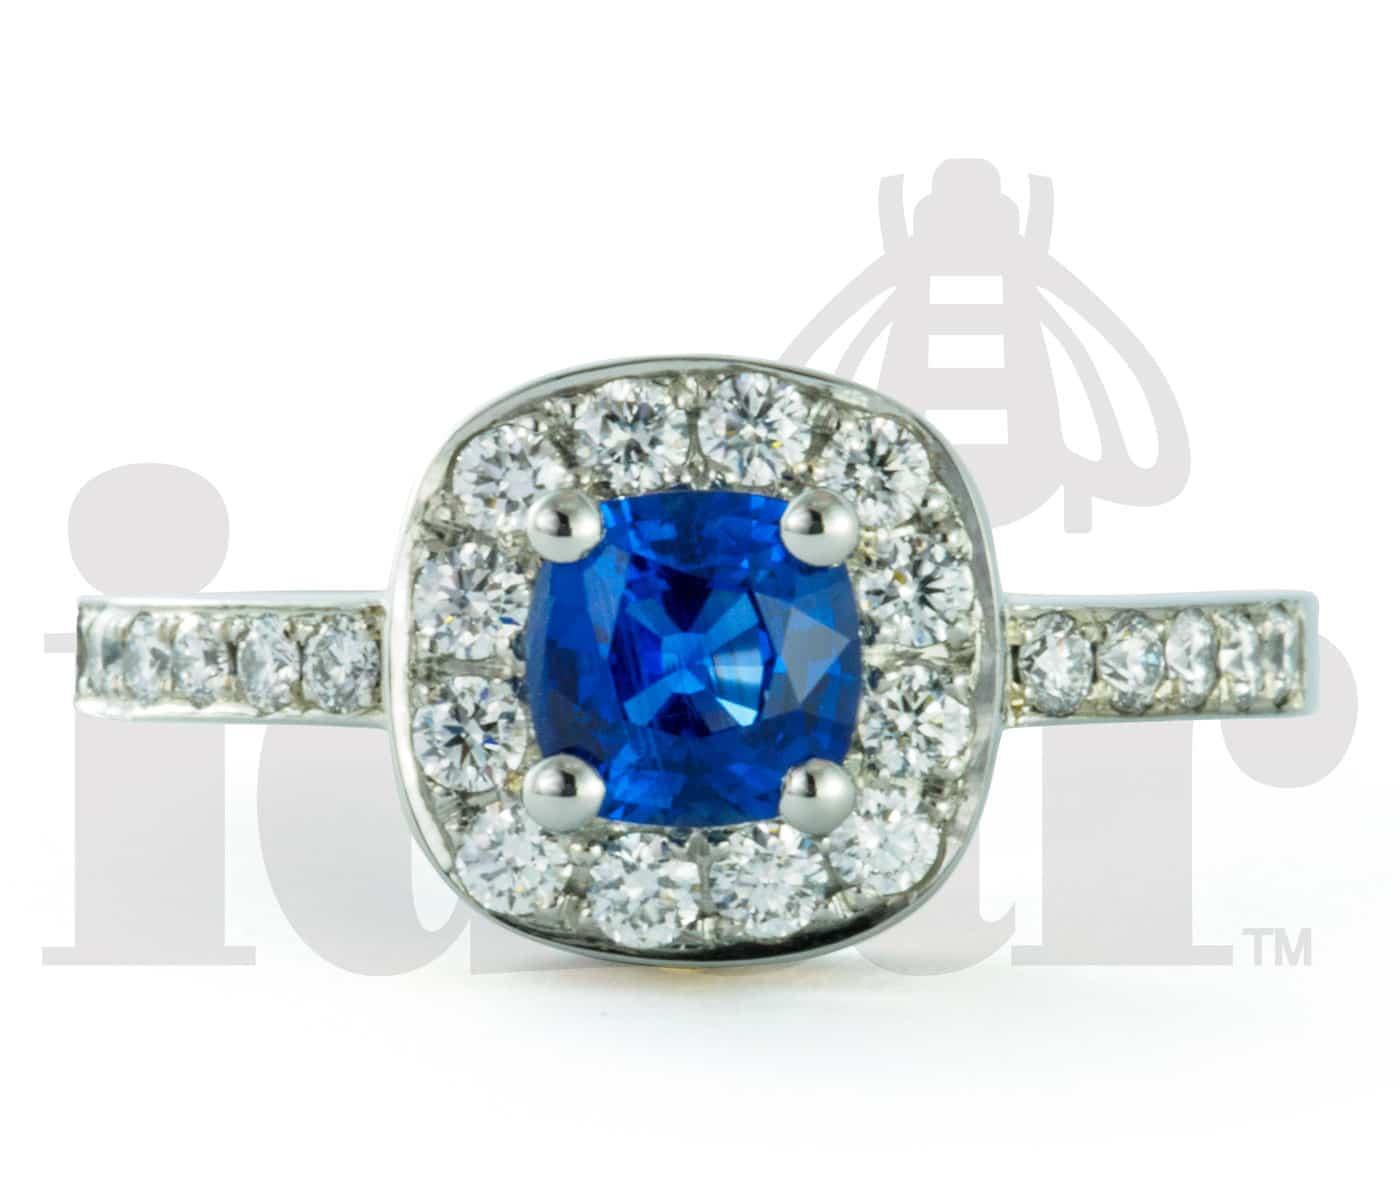 Idar Jewellers, diamonds, gold handcrafted jewellery, Blue Sapphire Halo Ring with Arabesque Gallery, Victoria, BC, Vancouver, Calgary, Edmonton, Ottawa, Toronto, Montreal, Canada